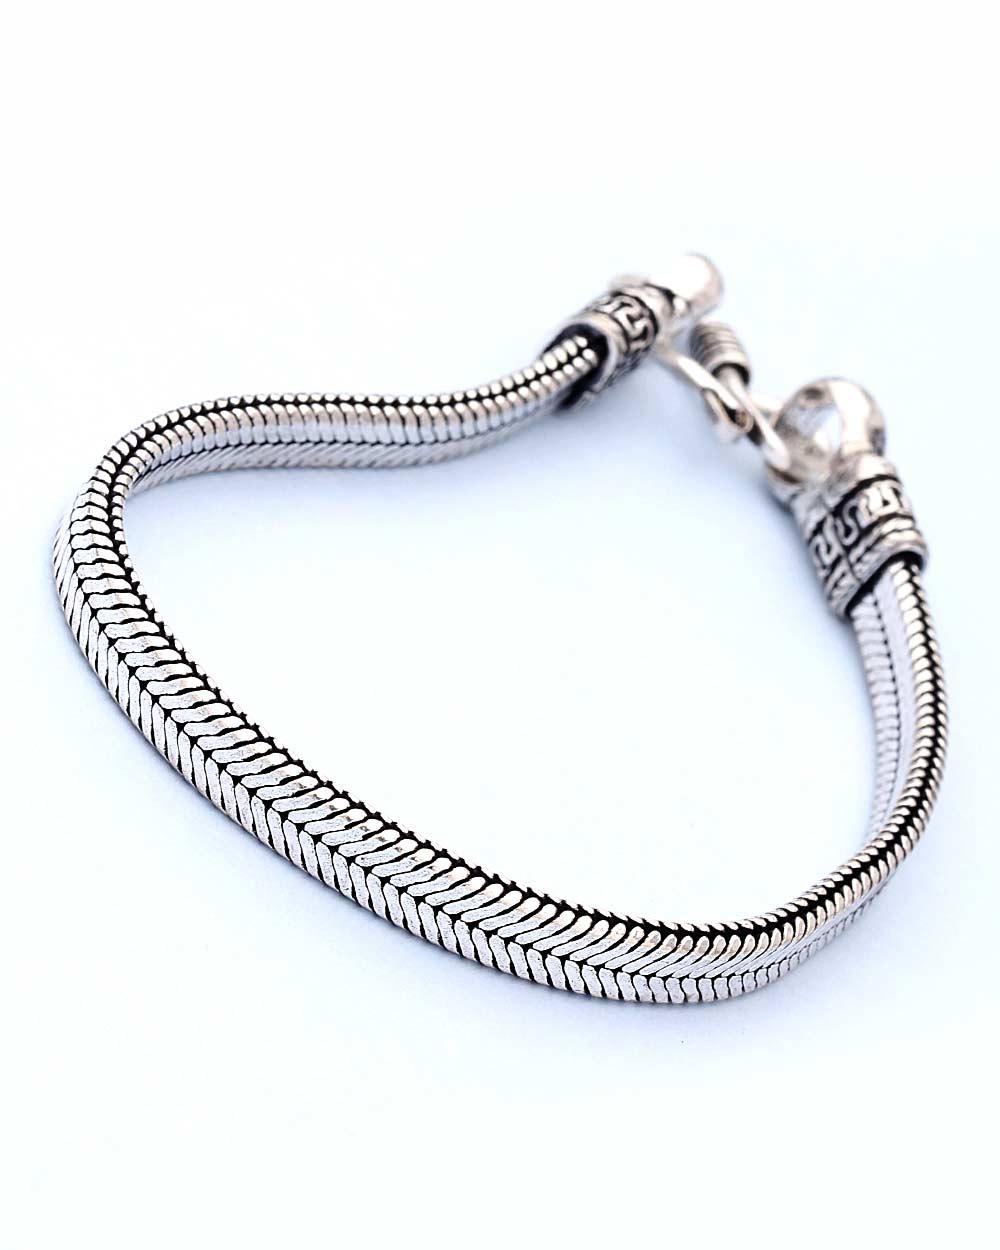 Oxidized Silver Bracelet Featuring Simple & Smart Look | Buy ...